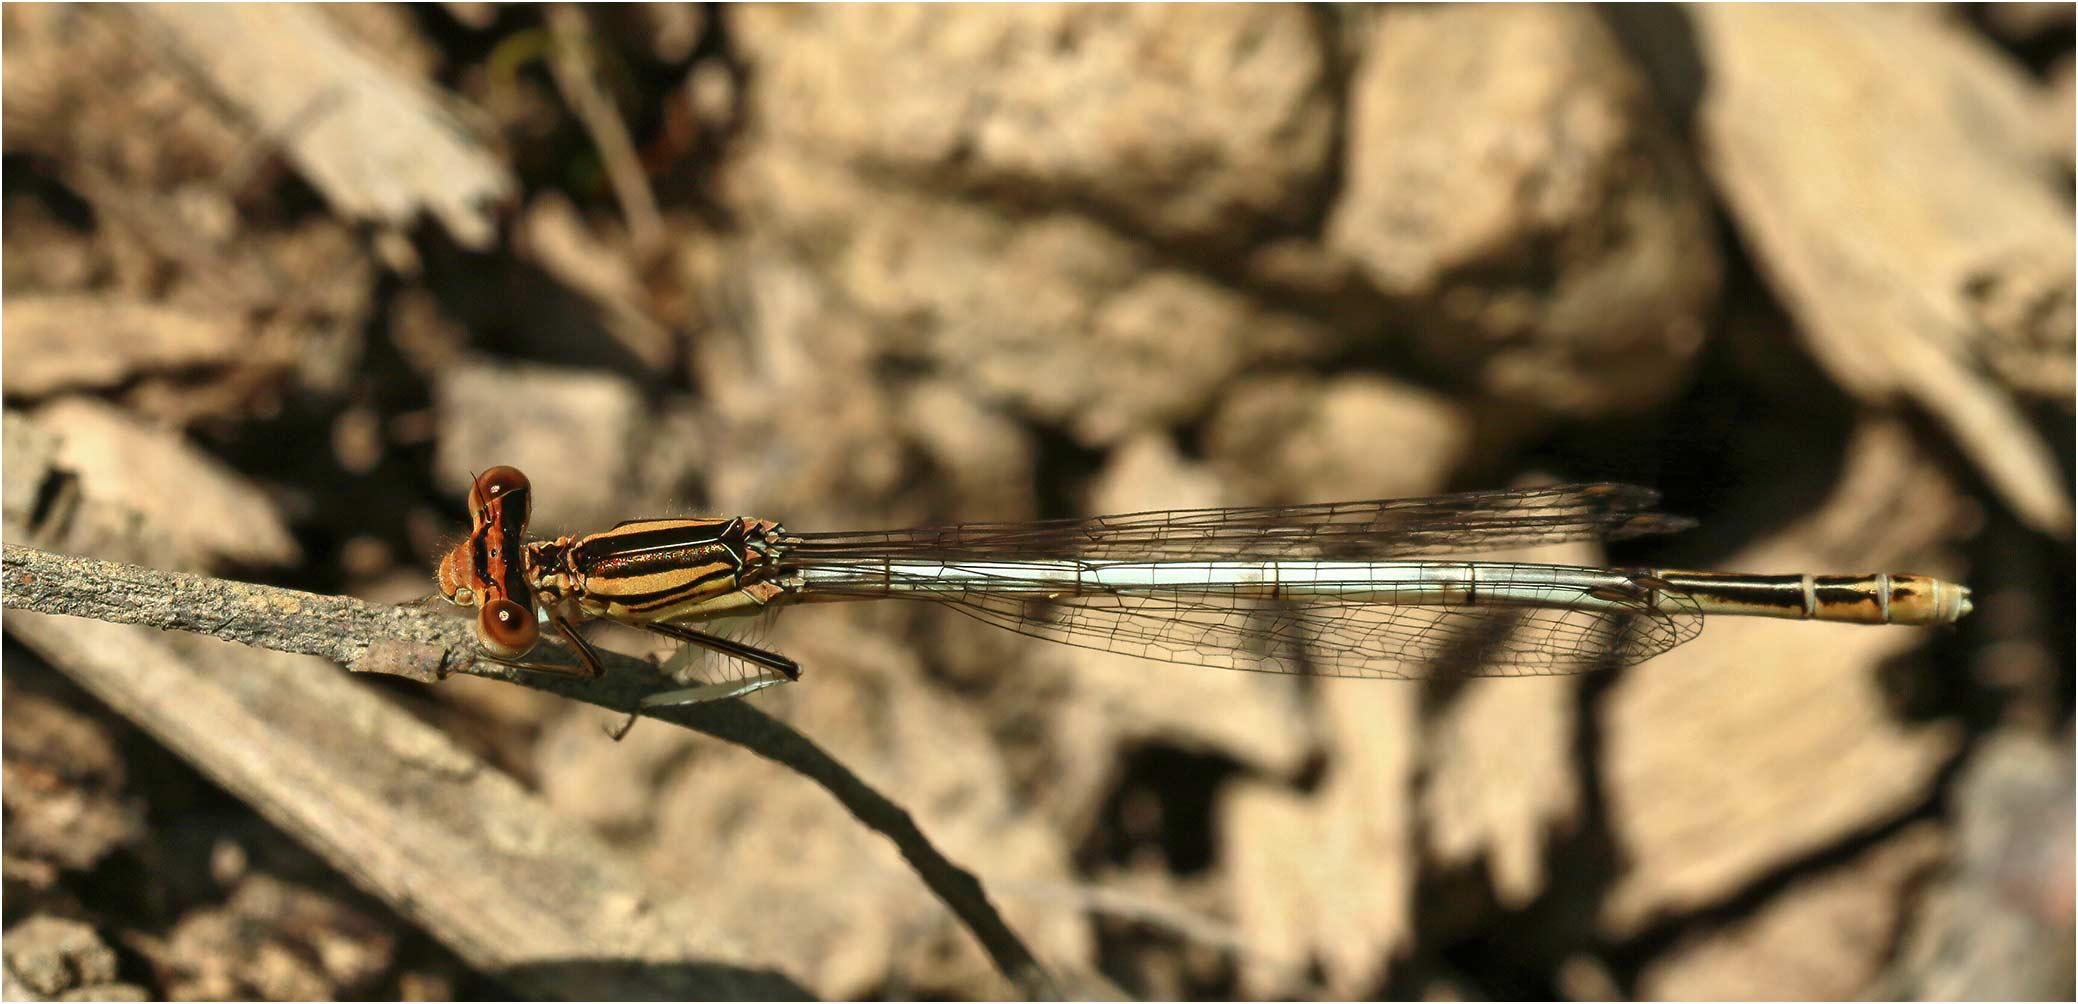 Platycnemis latipes femelle, Castelnau-Chalosse (France-40), 04/07/2020